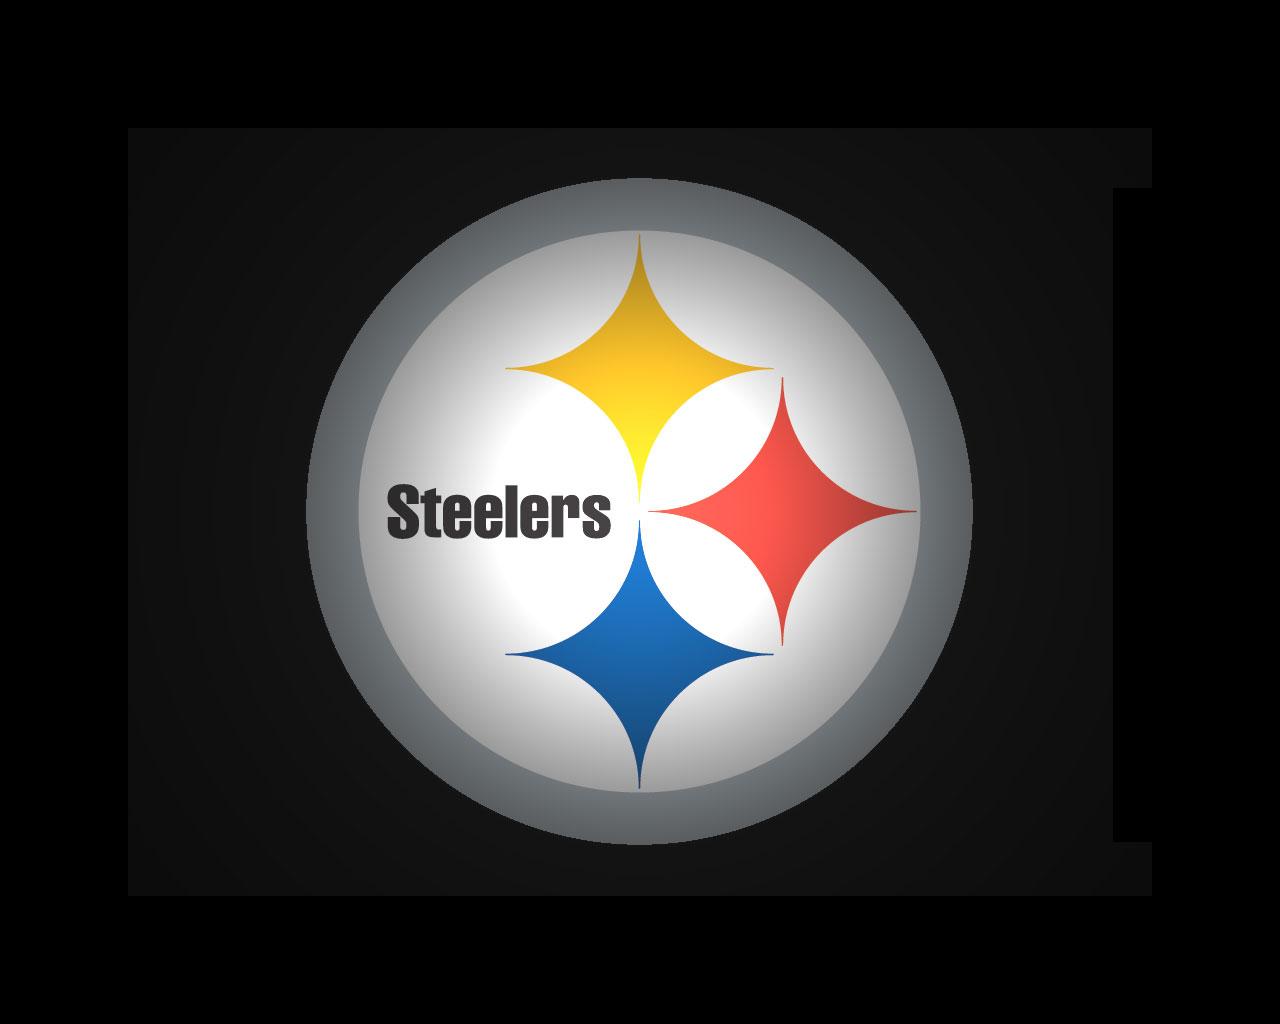 Steelers wallpaper wallpaper Pittsburgh Steelers wallpapers 1280x1024